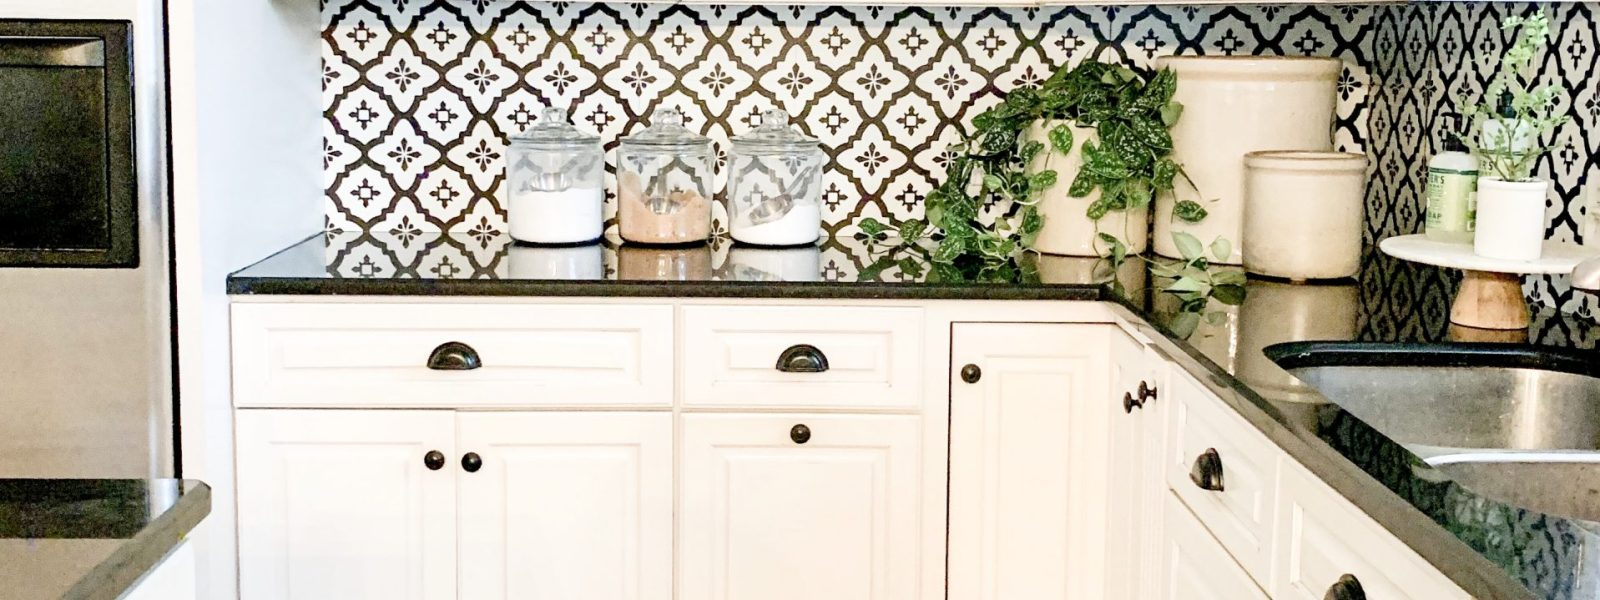 DIY Kitchen Backsplash On a Budget